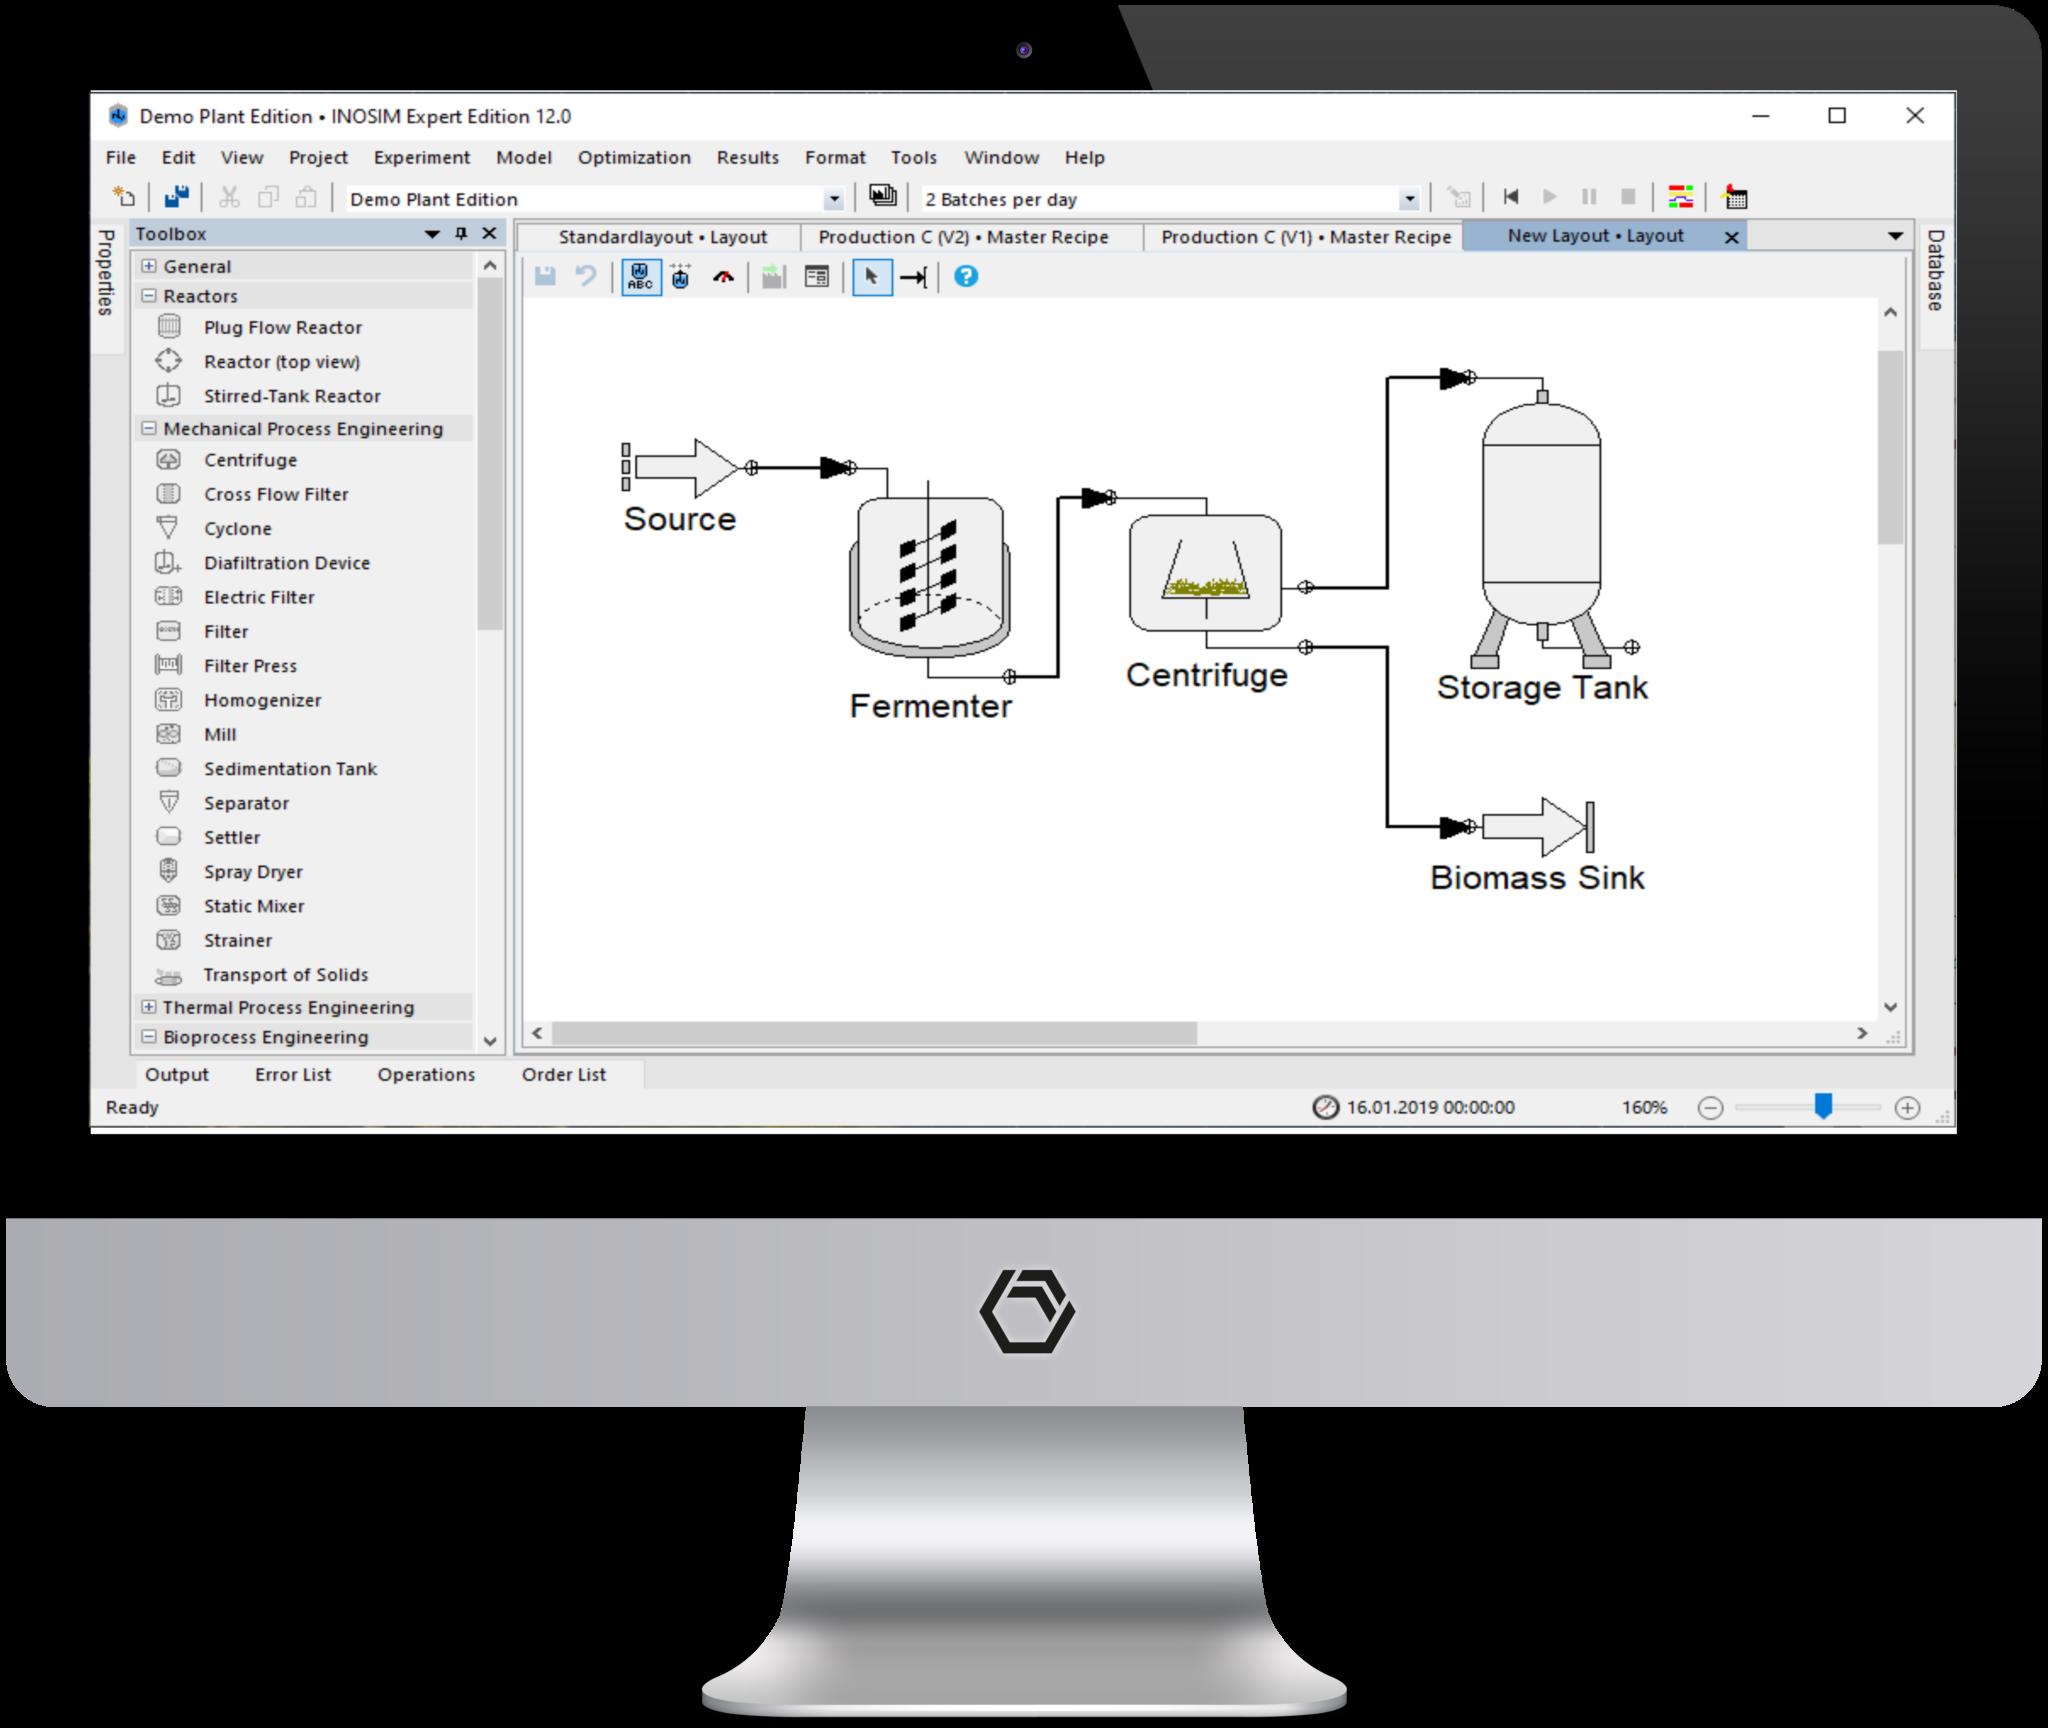 INOSIM User Interface to build digital twins and virtual plants easily